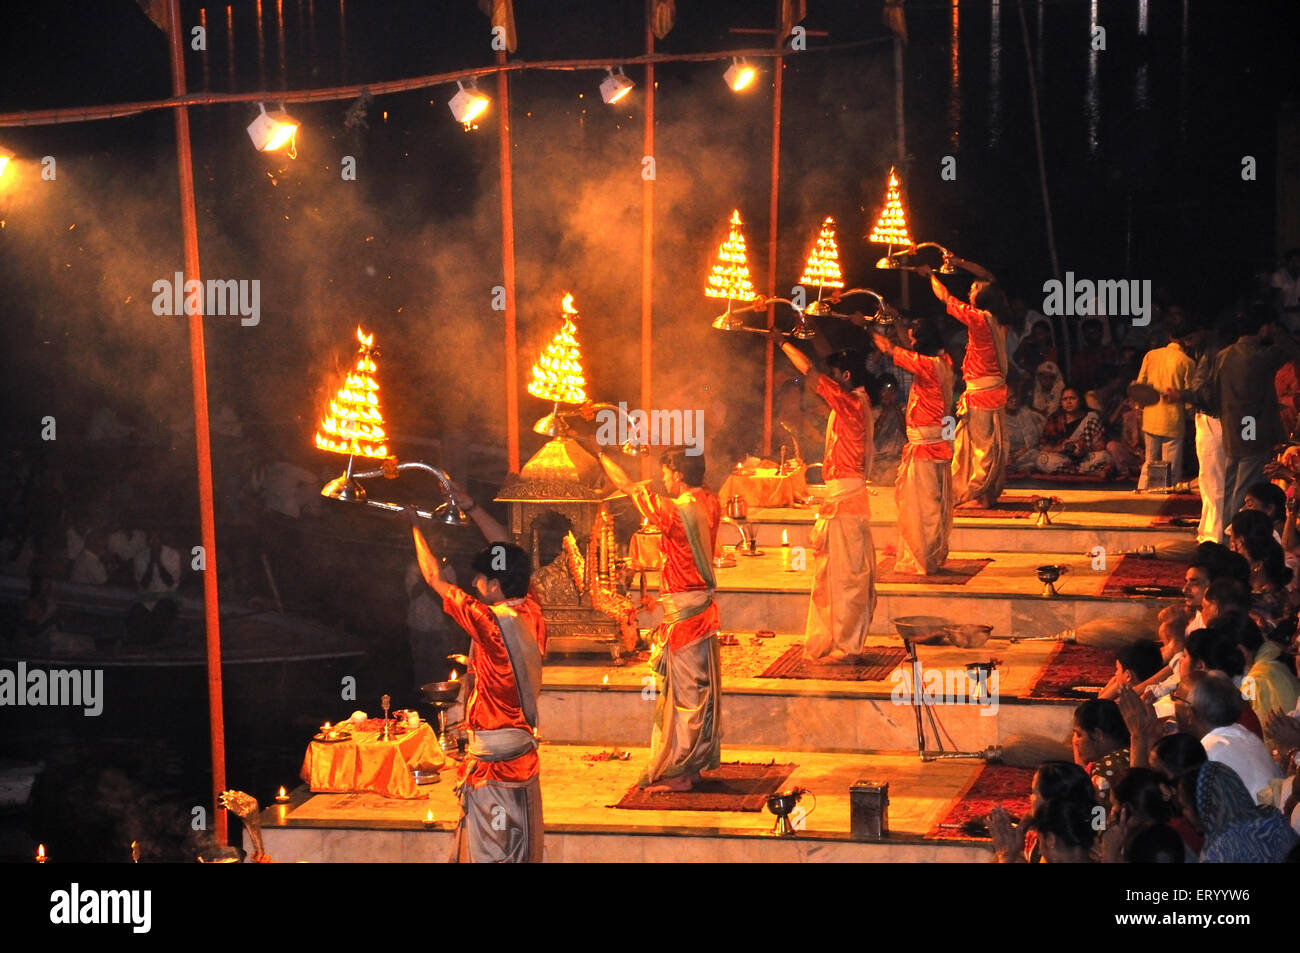 Ganga ganges arti à Varanasi ghat; Uttar Pradesh en Inde; - s/n 173477 Photo Stock